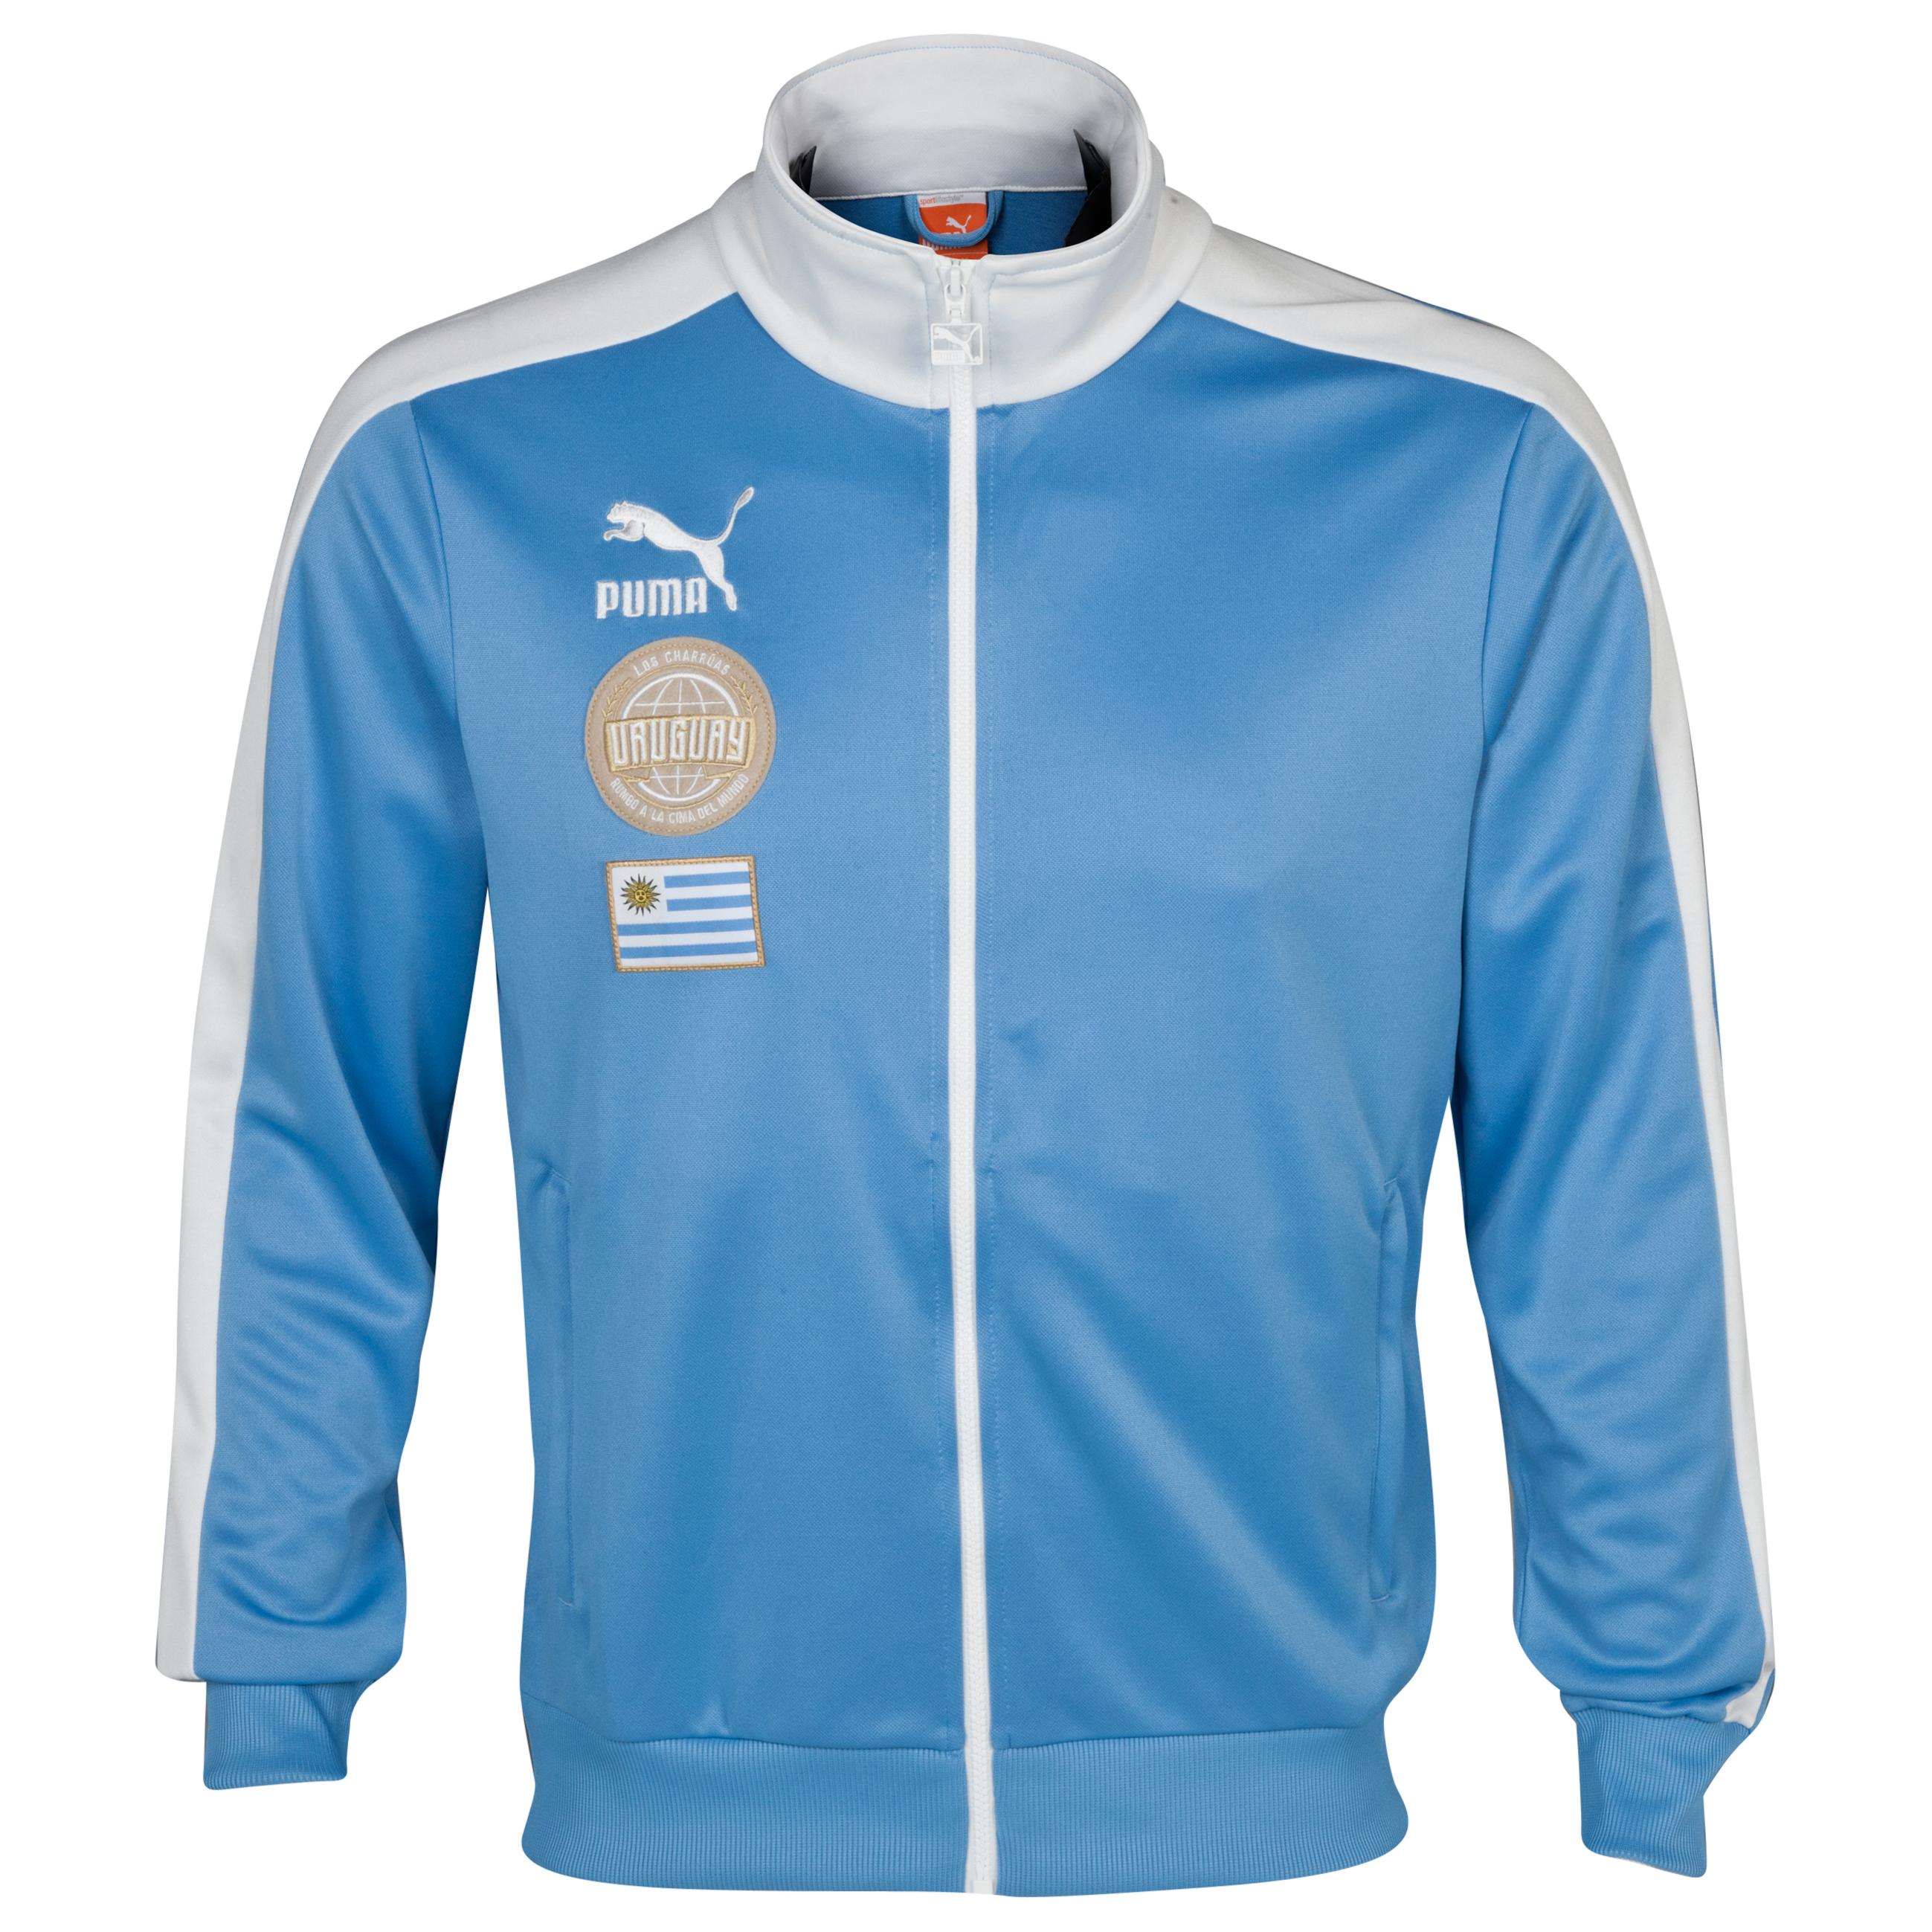 Puma FA T7 Track Jacket - Silver Lake Blue-AUF Uruguay